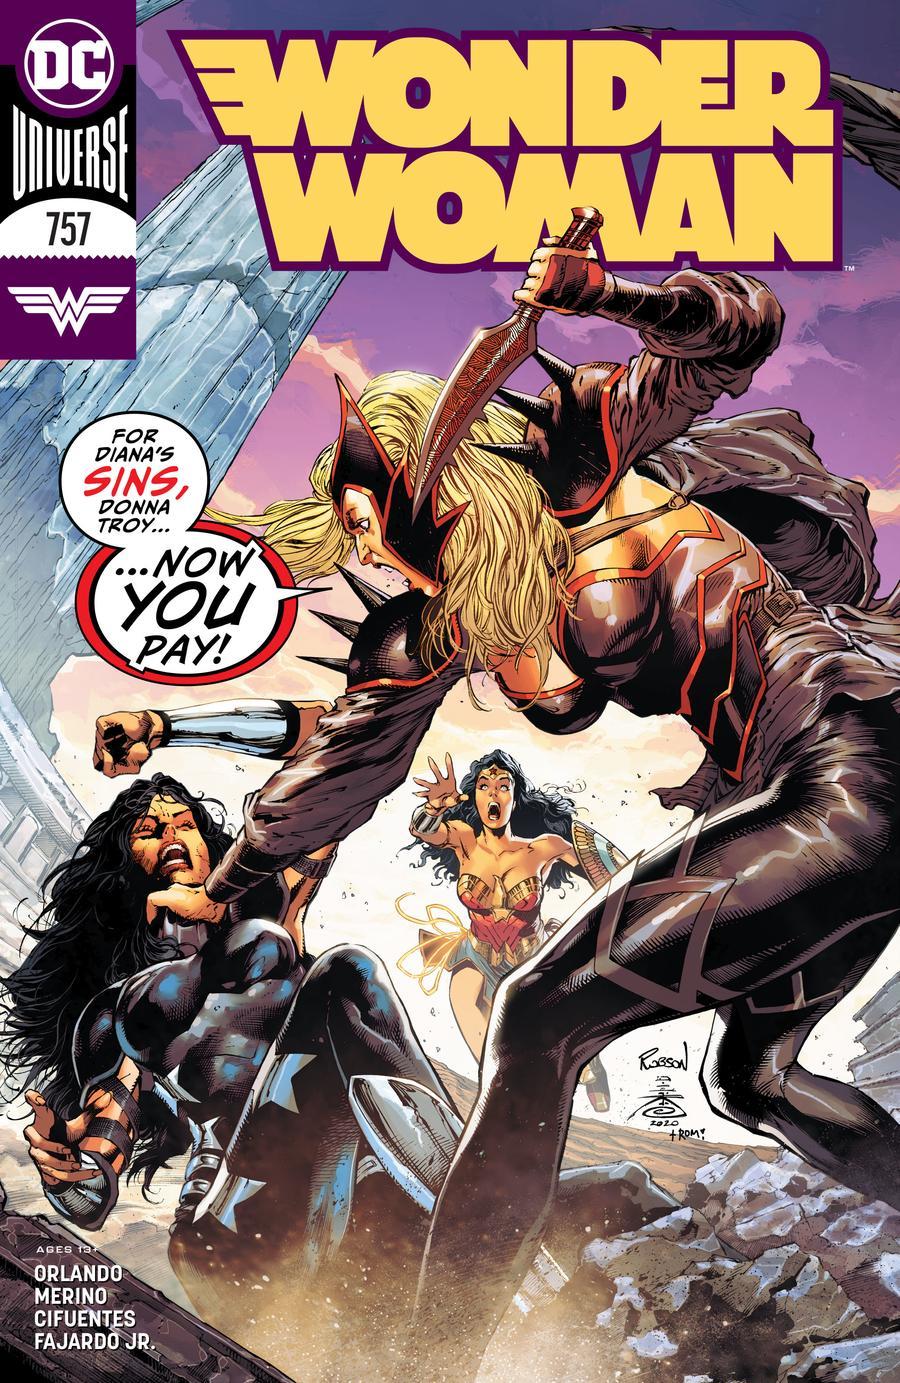 Wonder Woman Vol 5 #757 Cover A Regular Robson Rocha & Danny Miki Cover